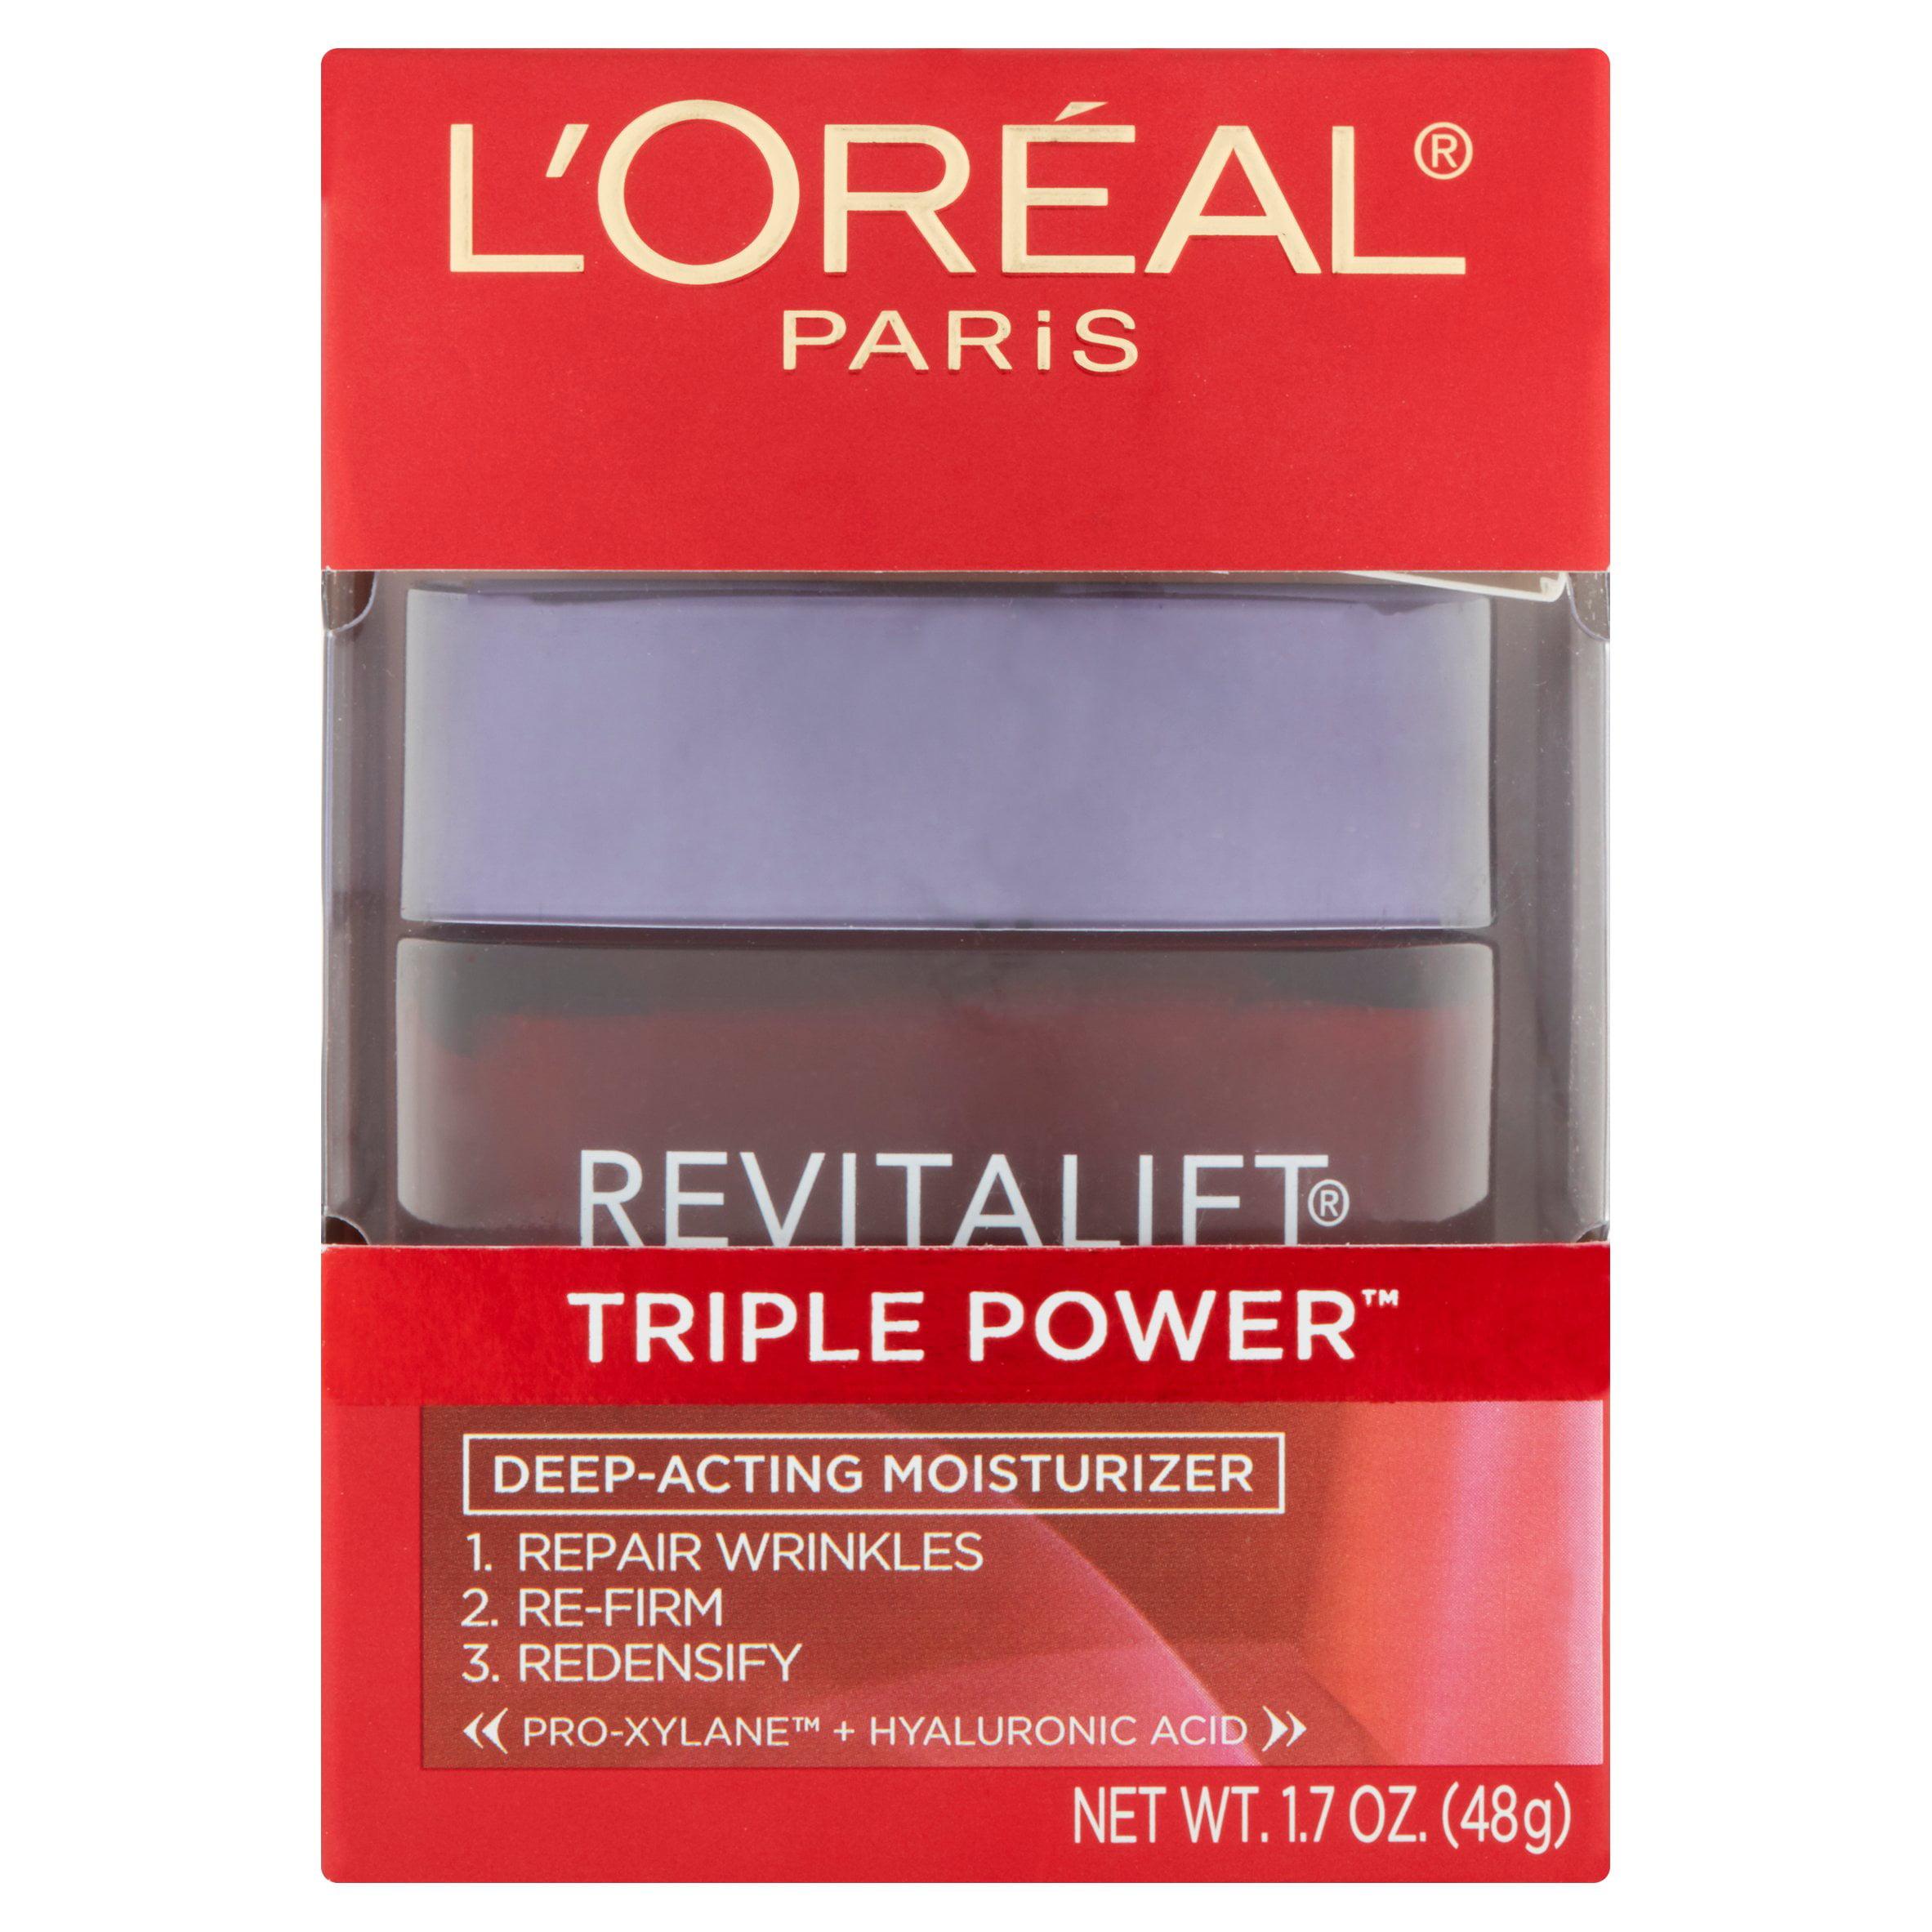 L'Oreal Paris Revitalift Triple Power Deep Acting Moisturizer